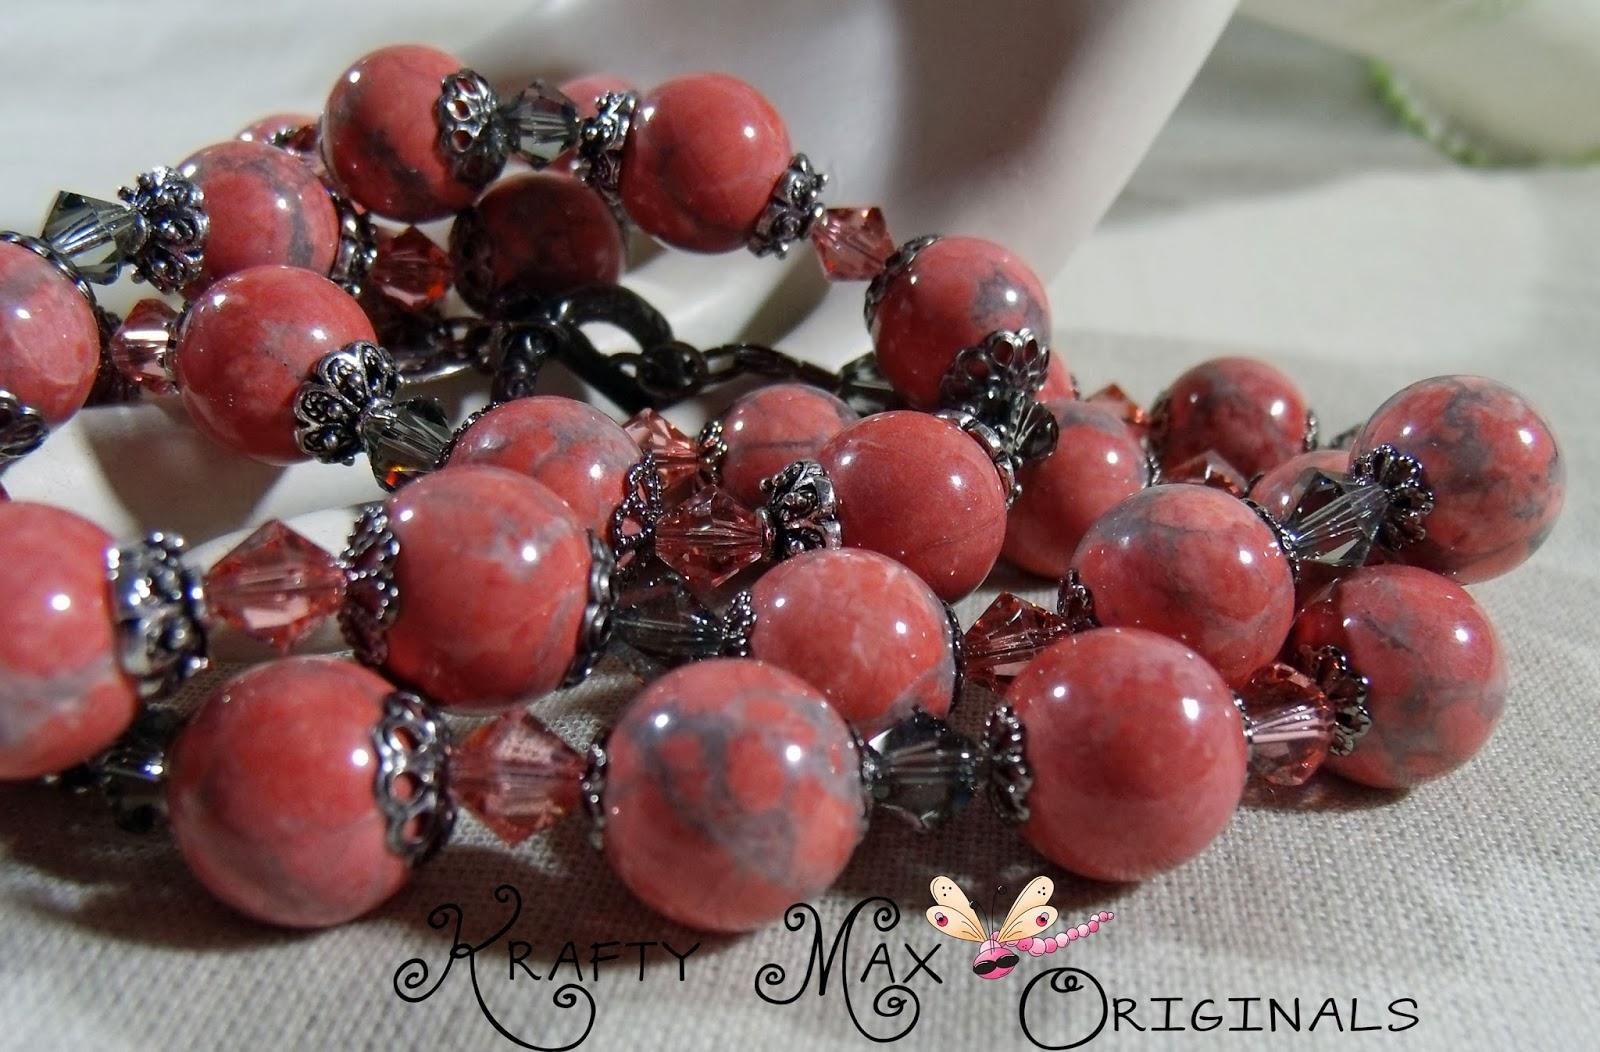 http://www.lajuliet.com/index.php/2013-01-04-15-21-51/ad/gemstone,92/exclusive-peach-and-grey-gemstone-and-swarovski-crystal-neckalce-set-a-krafty-max-original-design,287